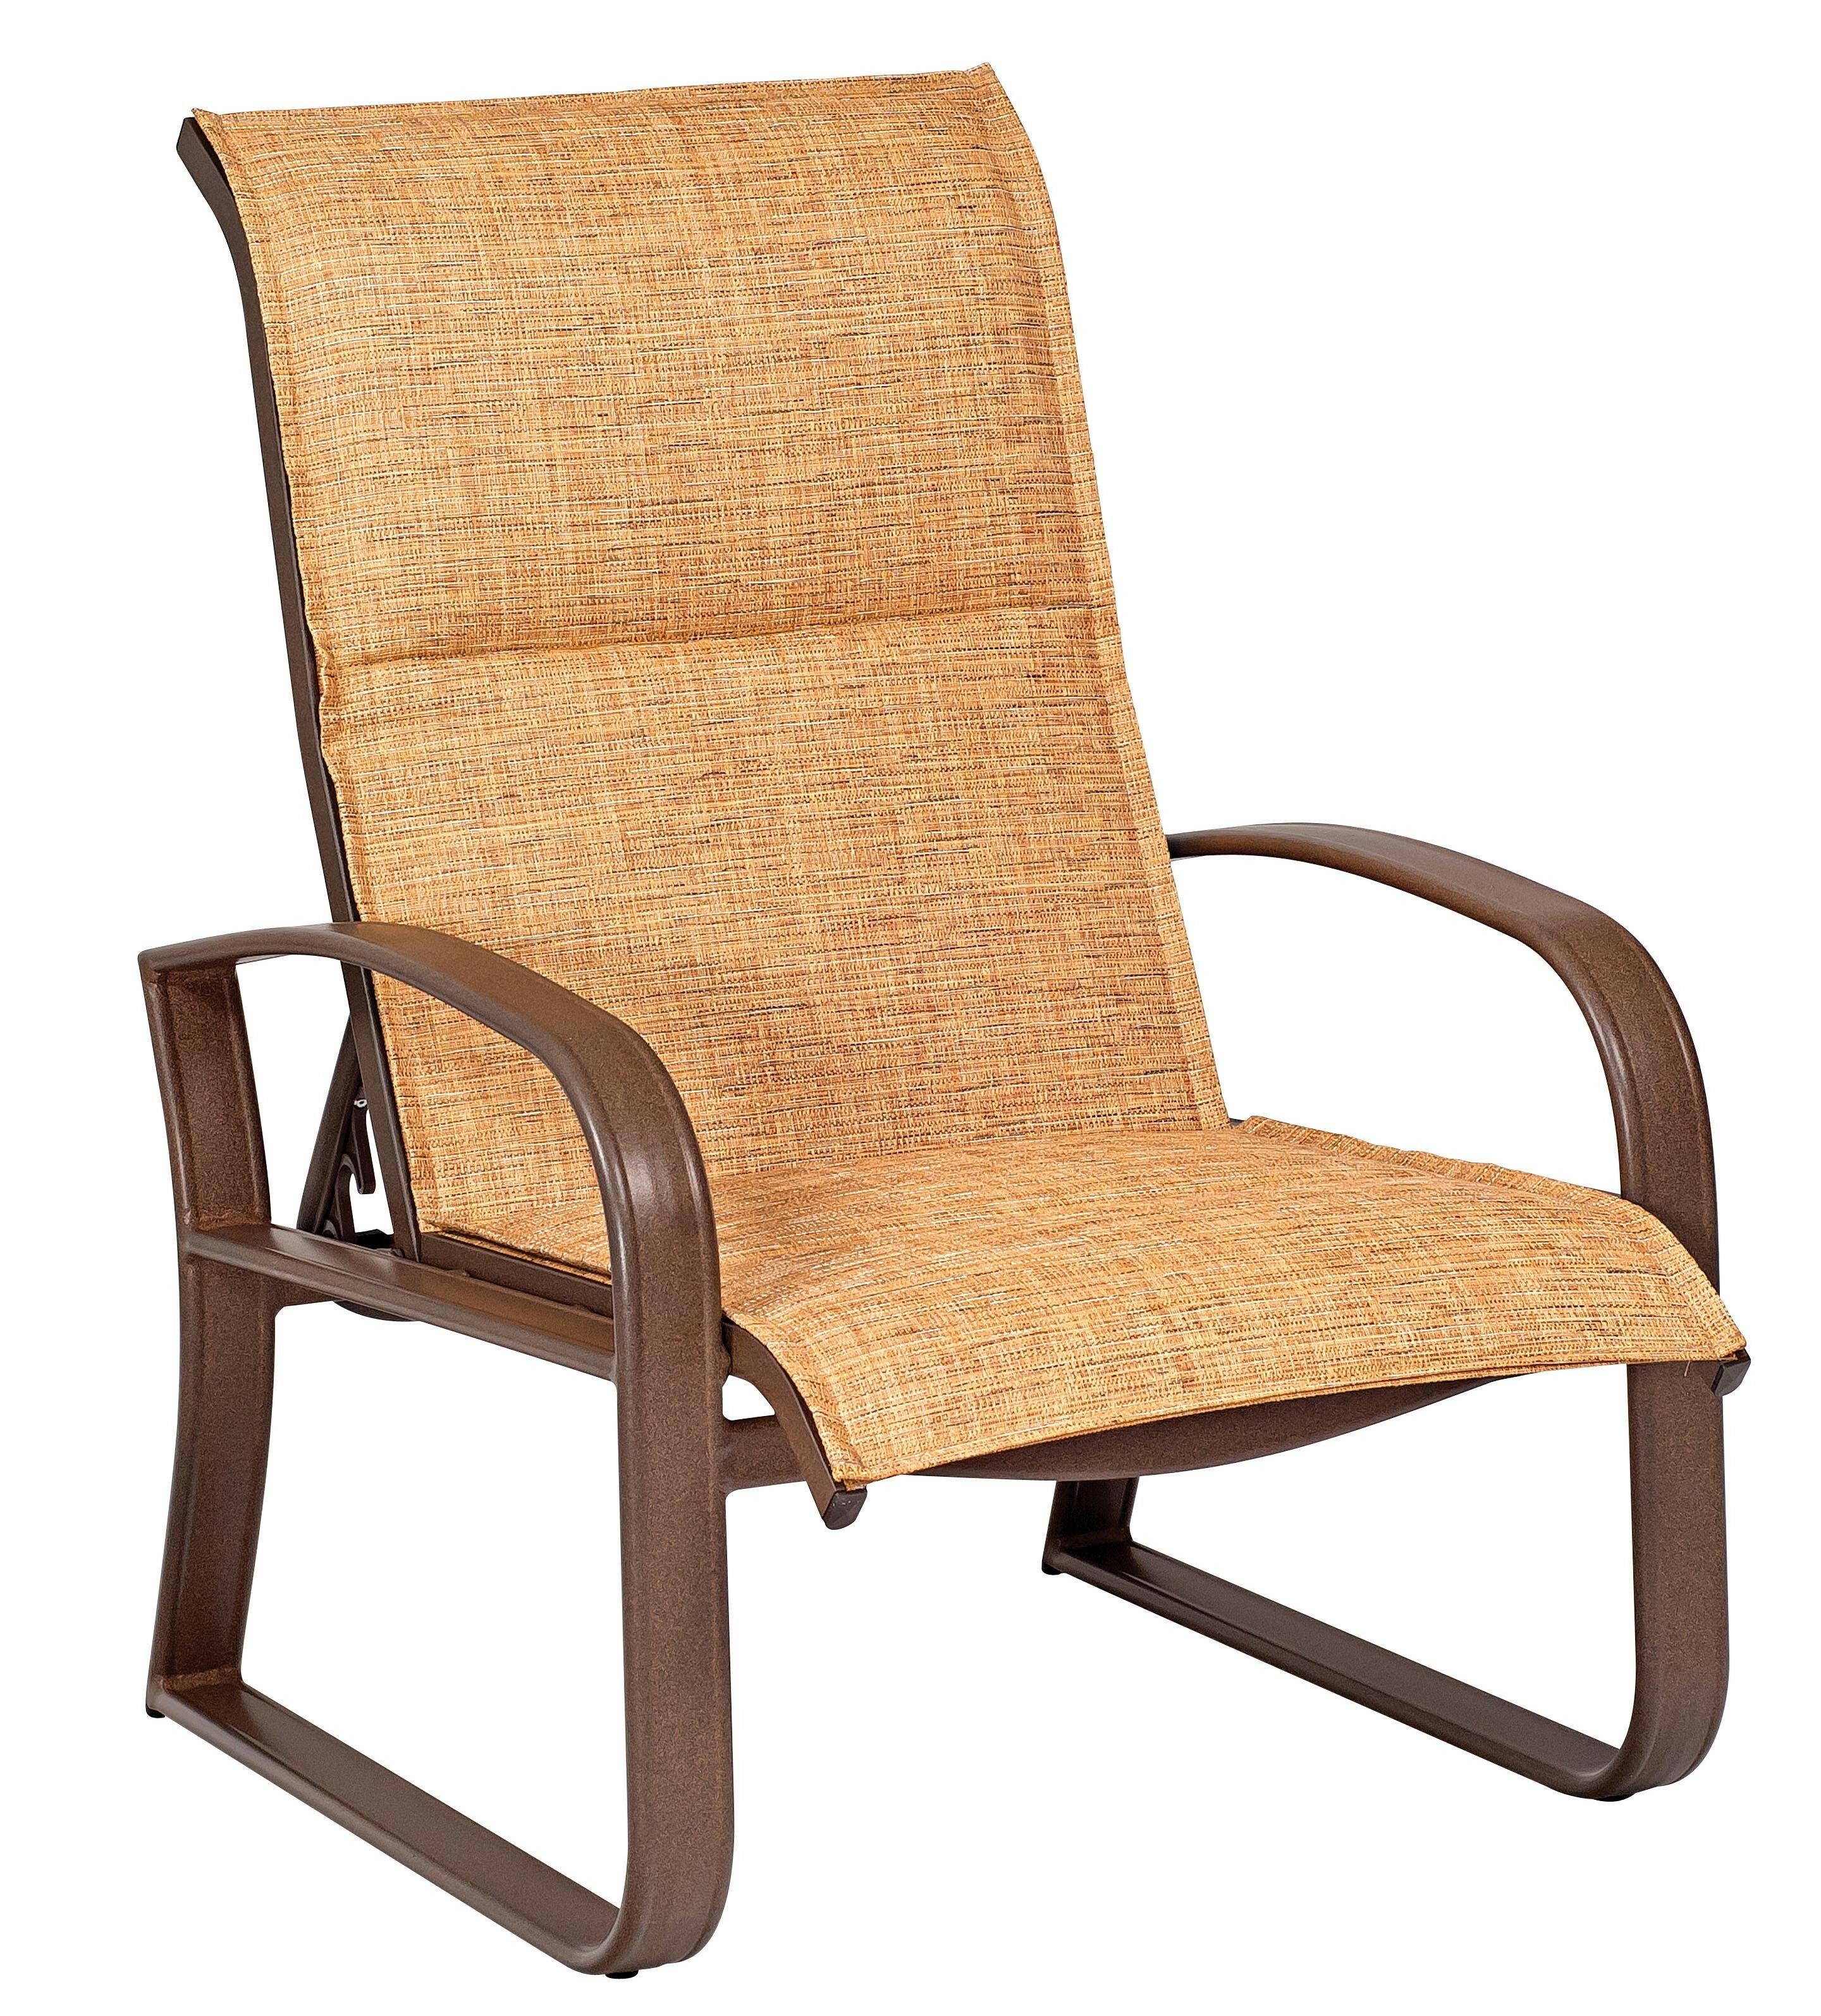 woodard cayman isle sling adjustable patio chair wayfair rh wayfair com adjustable plastic patio chairs adjustable patio chairs and ottomans